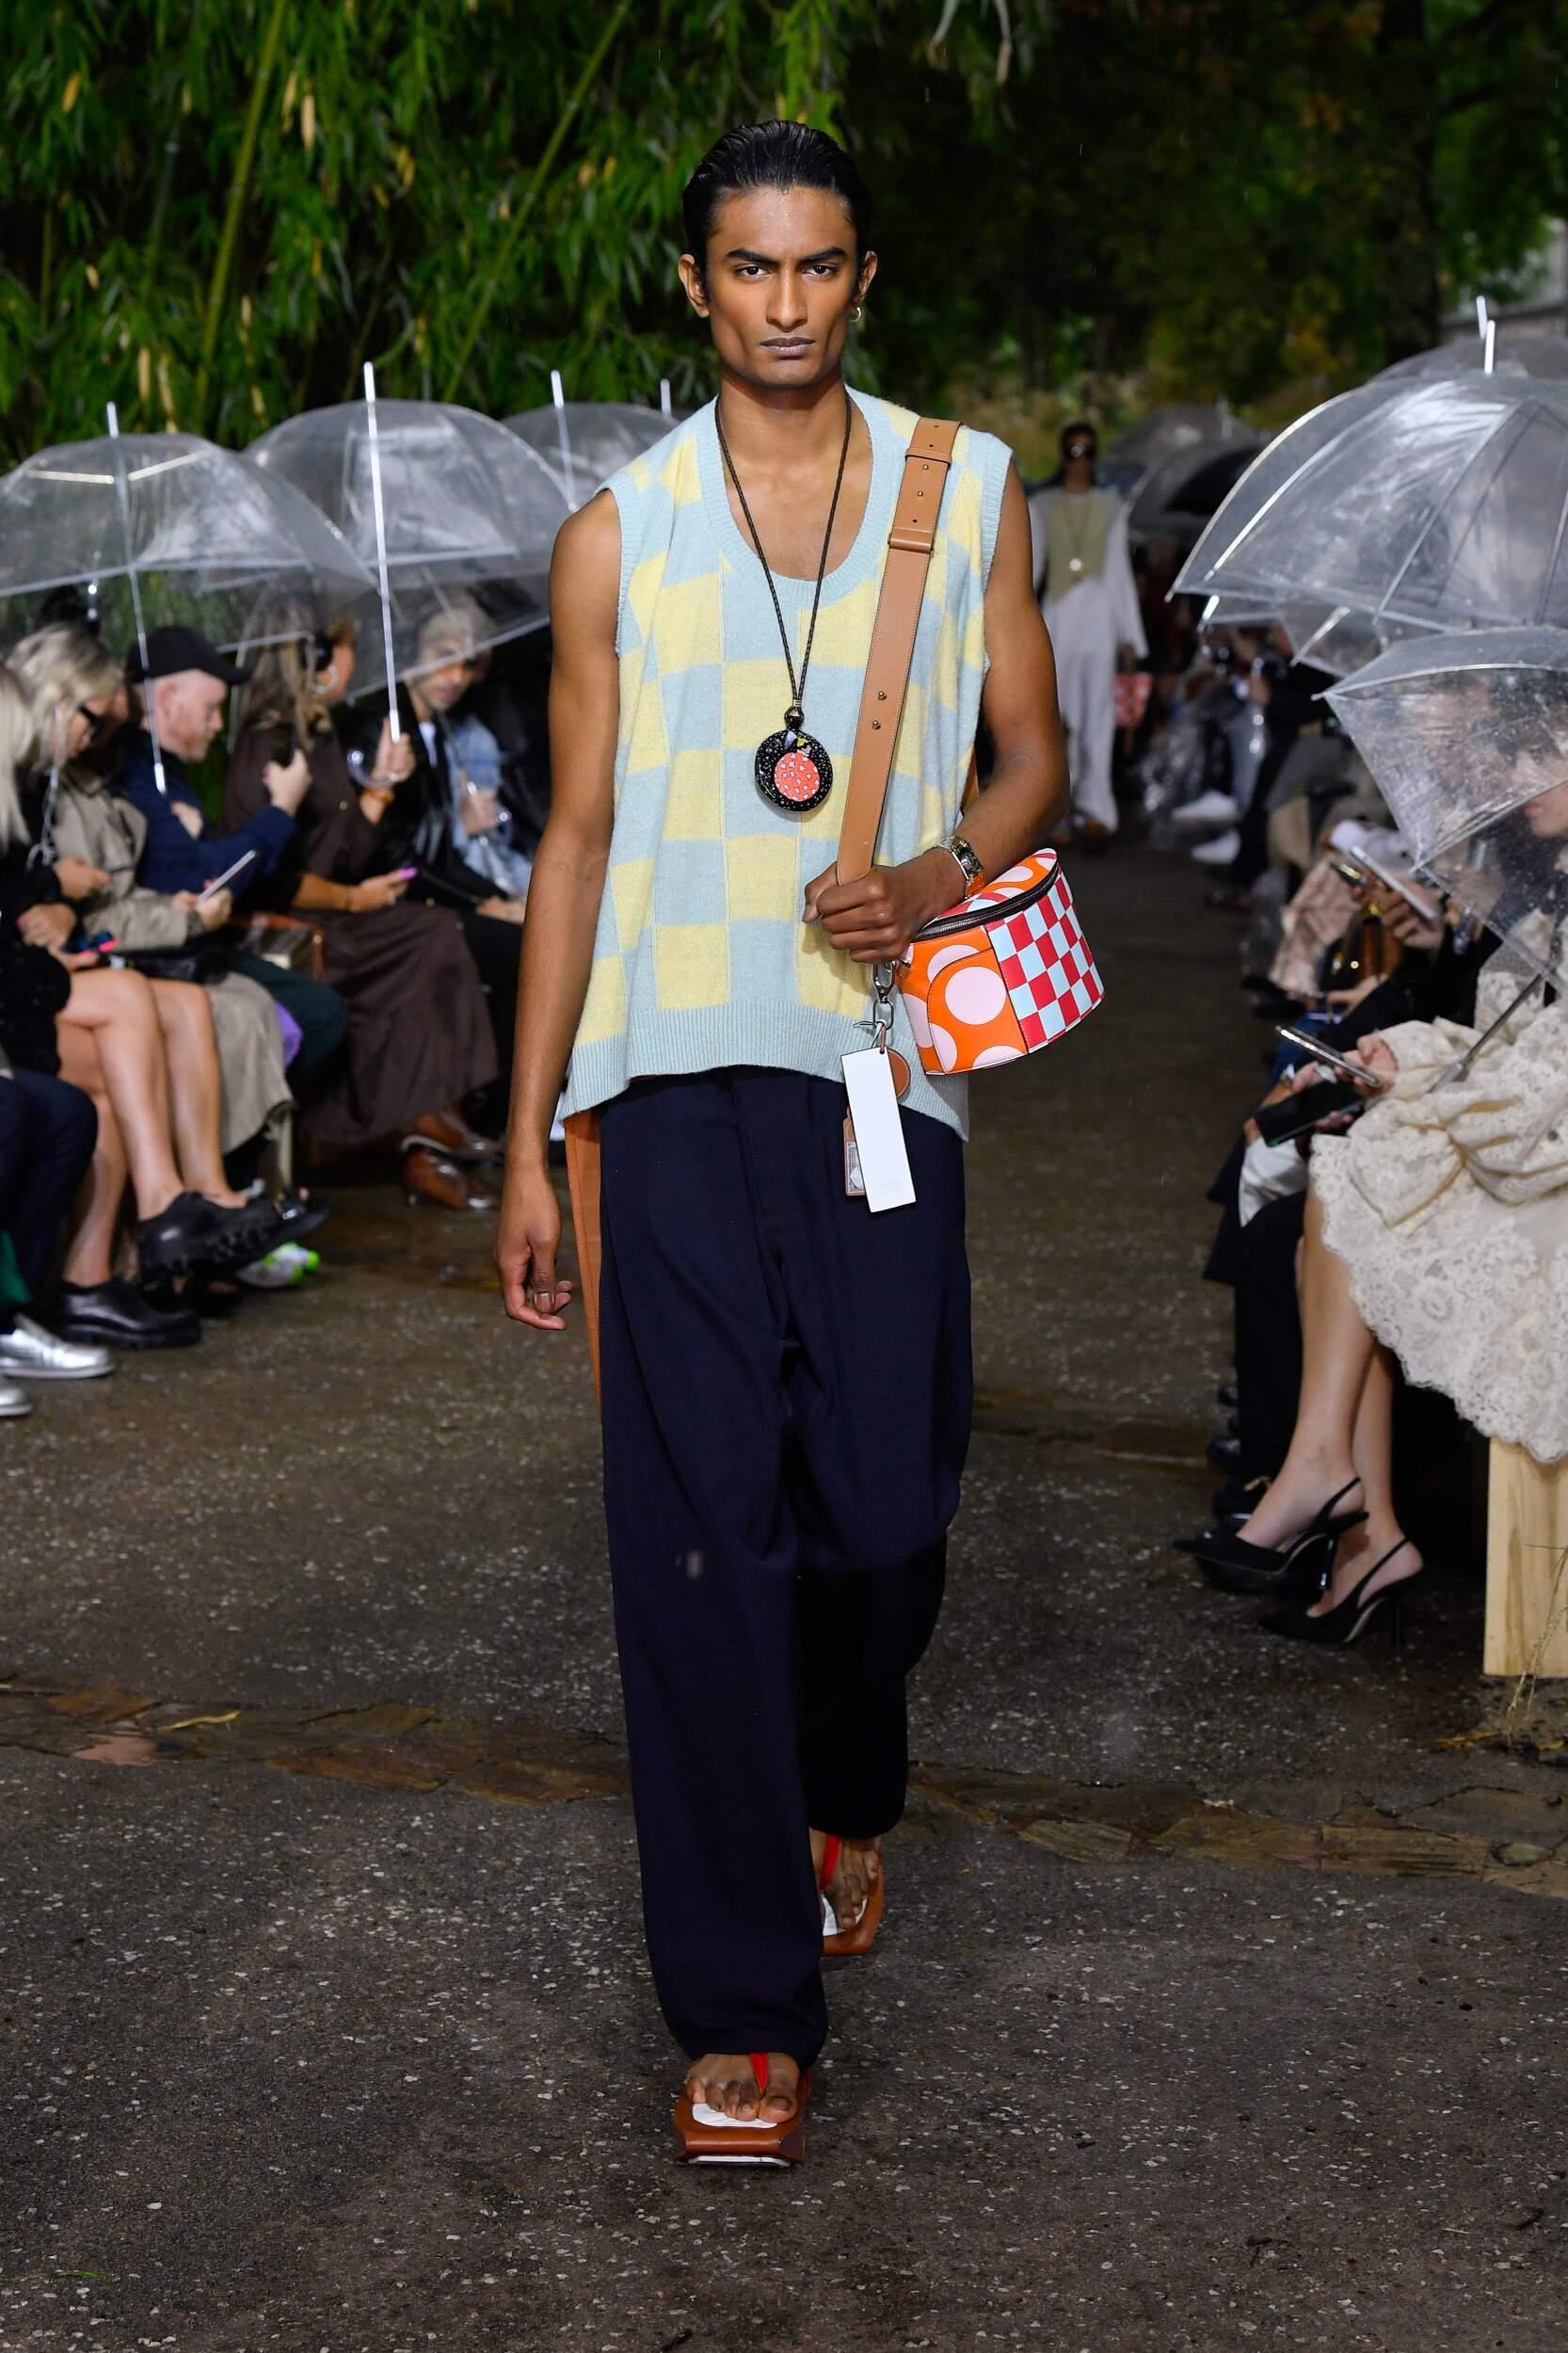 Catwalk Lanvin Man Fashion Show Summer 2020